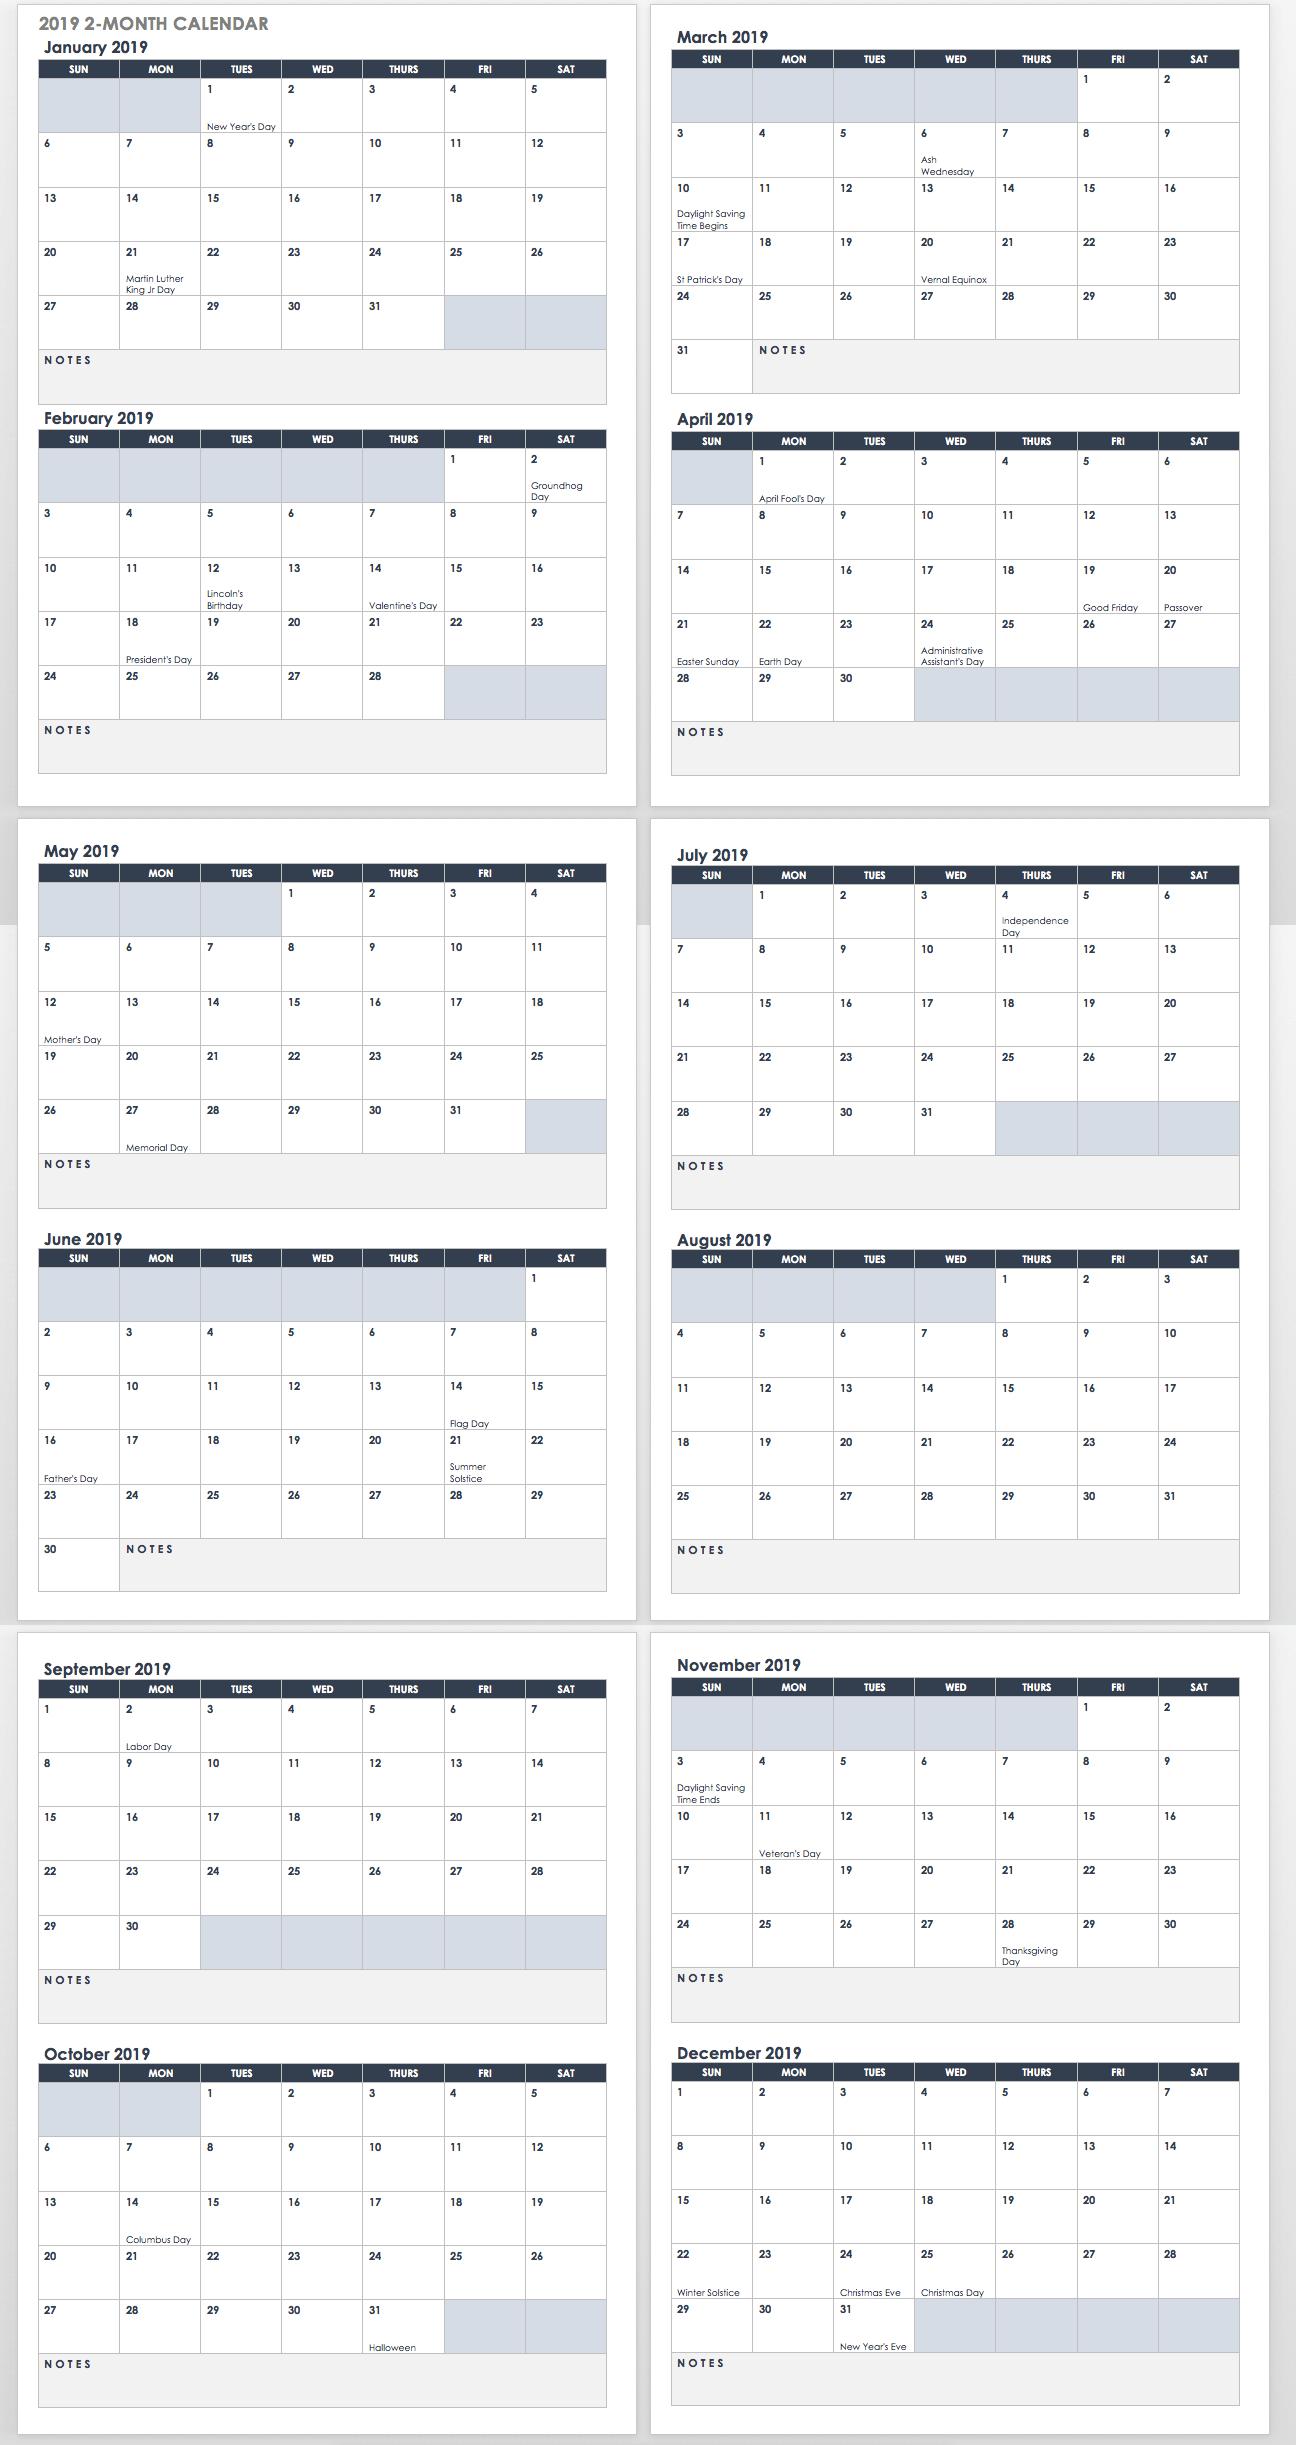 15 Free Monthly Calendar Templates | Smartsheet throughout Monthly Calendar Templates 12 Months